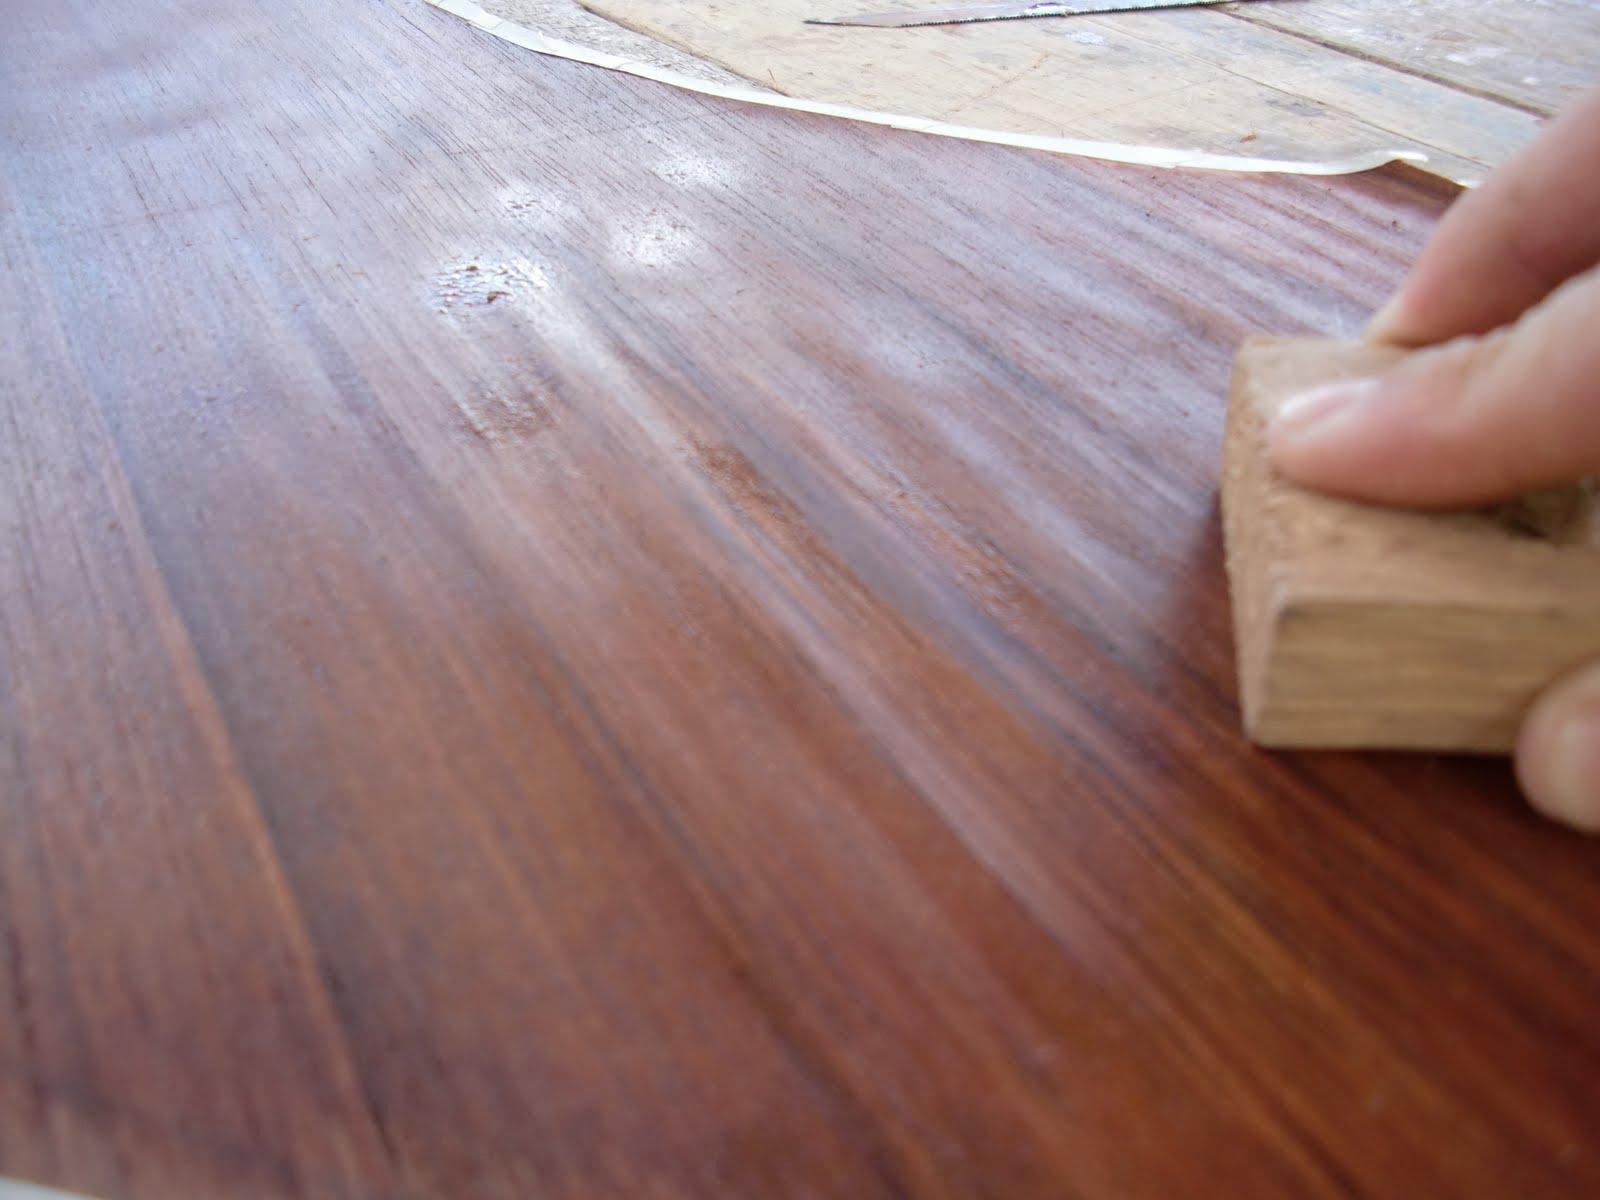 Decoraciones manualidades en madera pegar lamina de for Laminas para pared